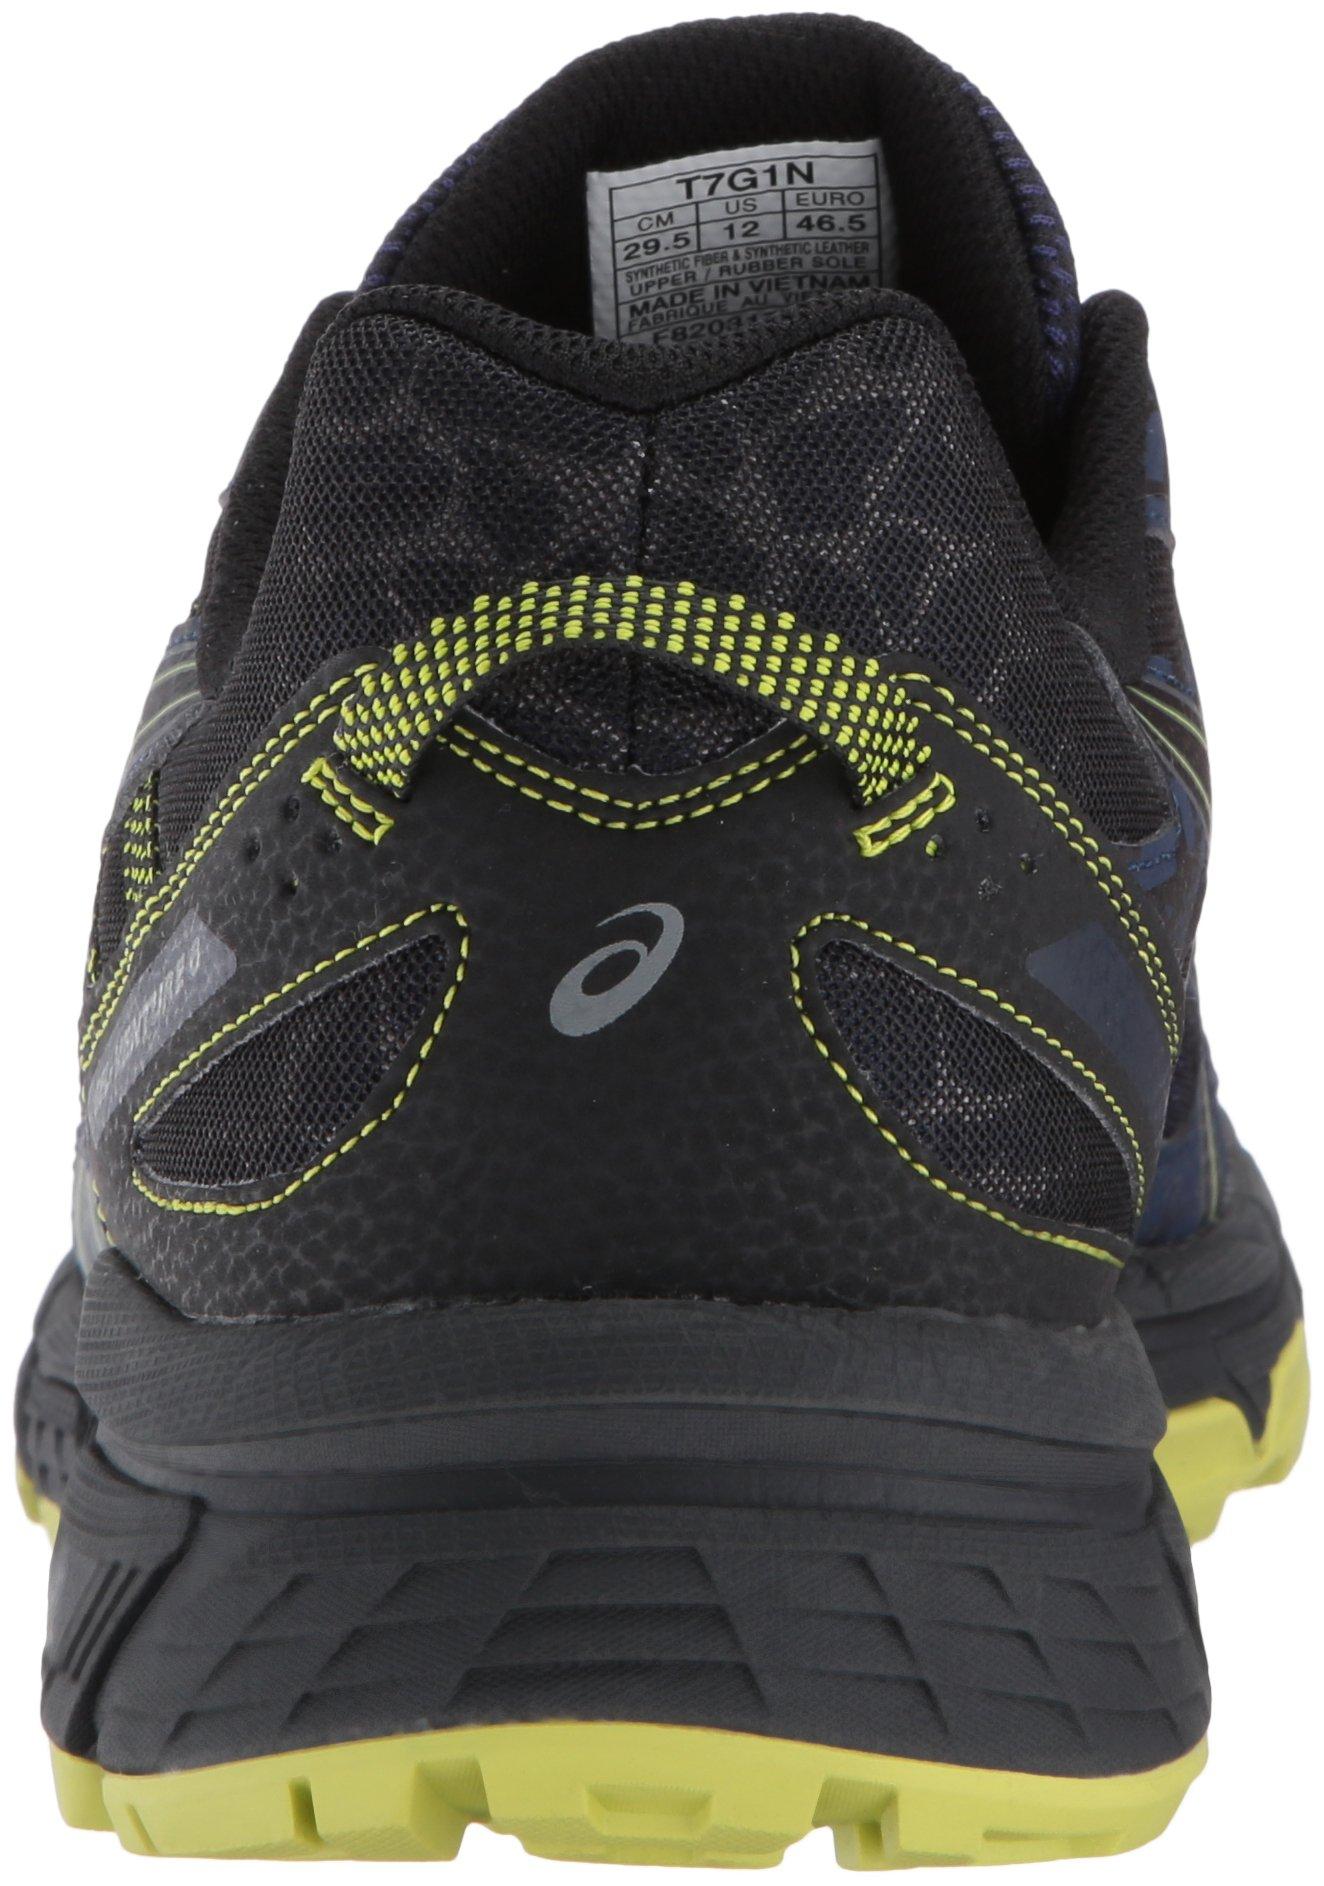 ASICS Mens Gel-Venture 6 Running Shoe, Indigo Blue/Black/Energy Green, 7 Medium US by ASICS (Image #2)